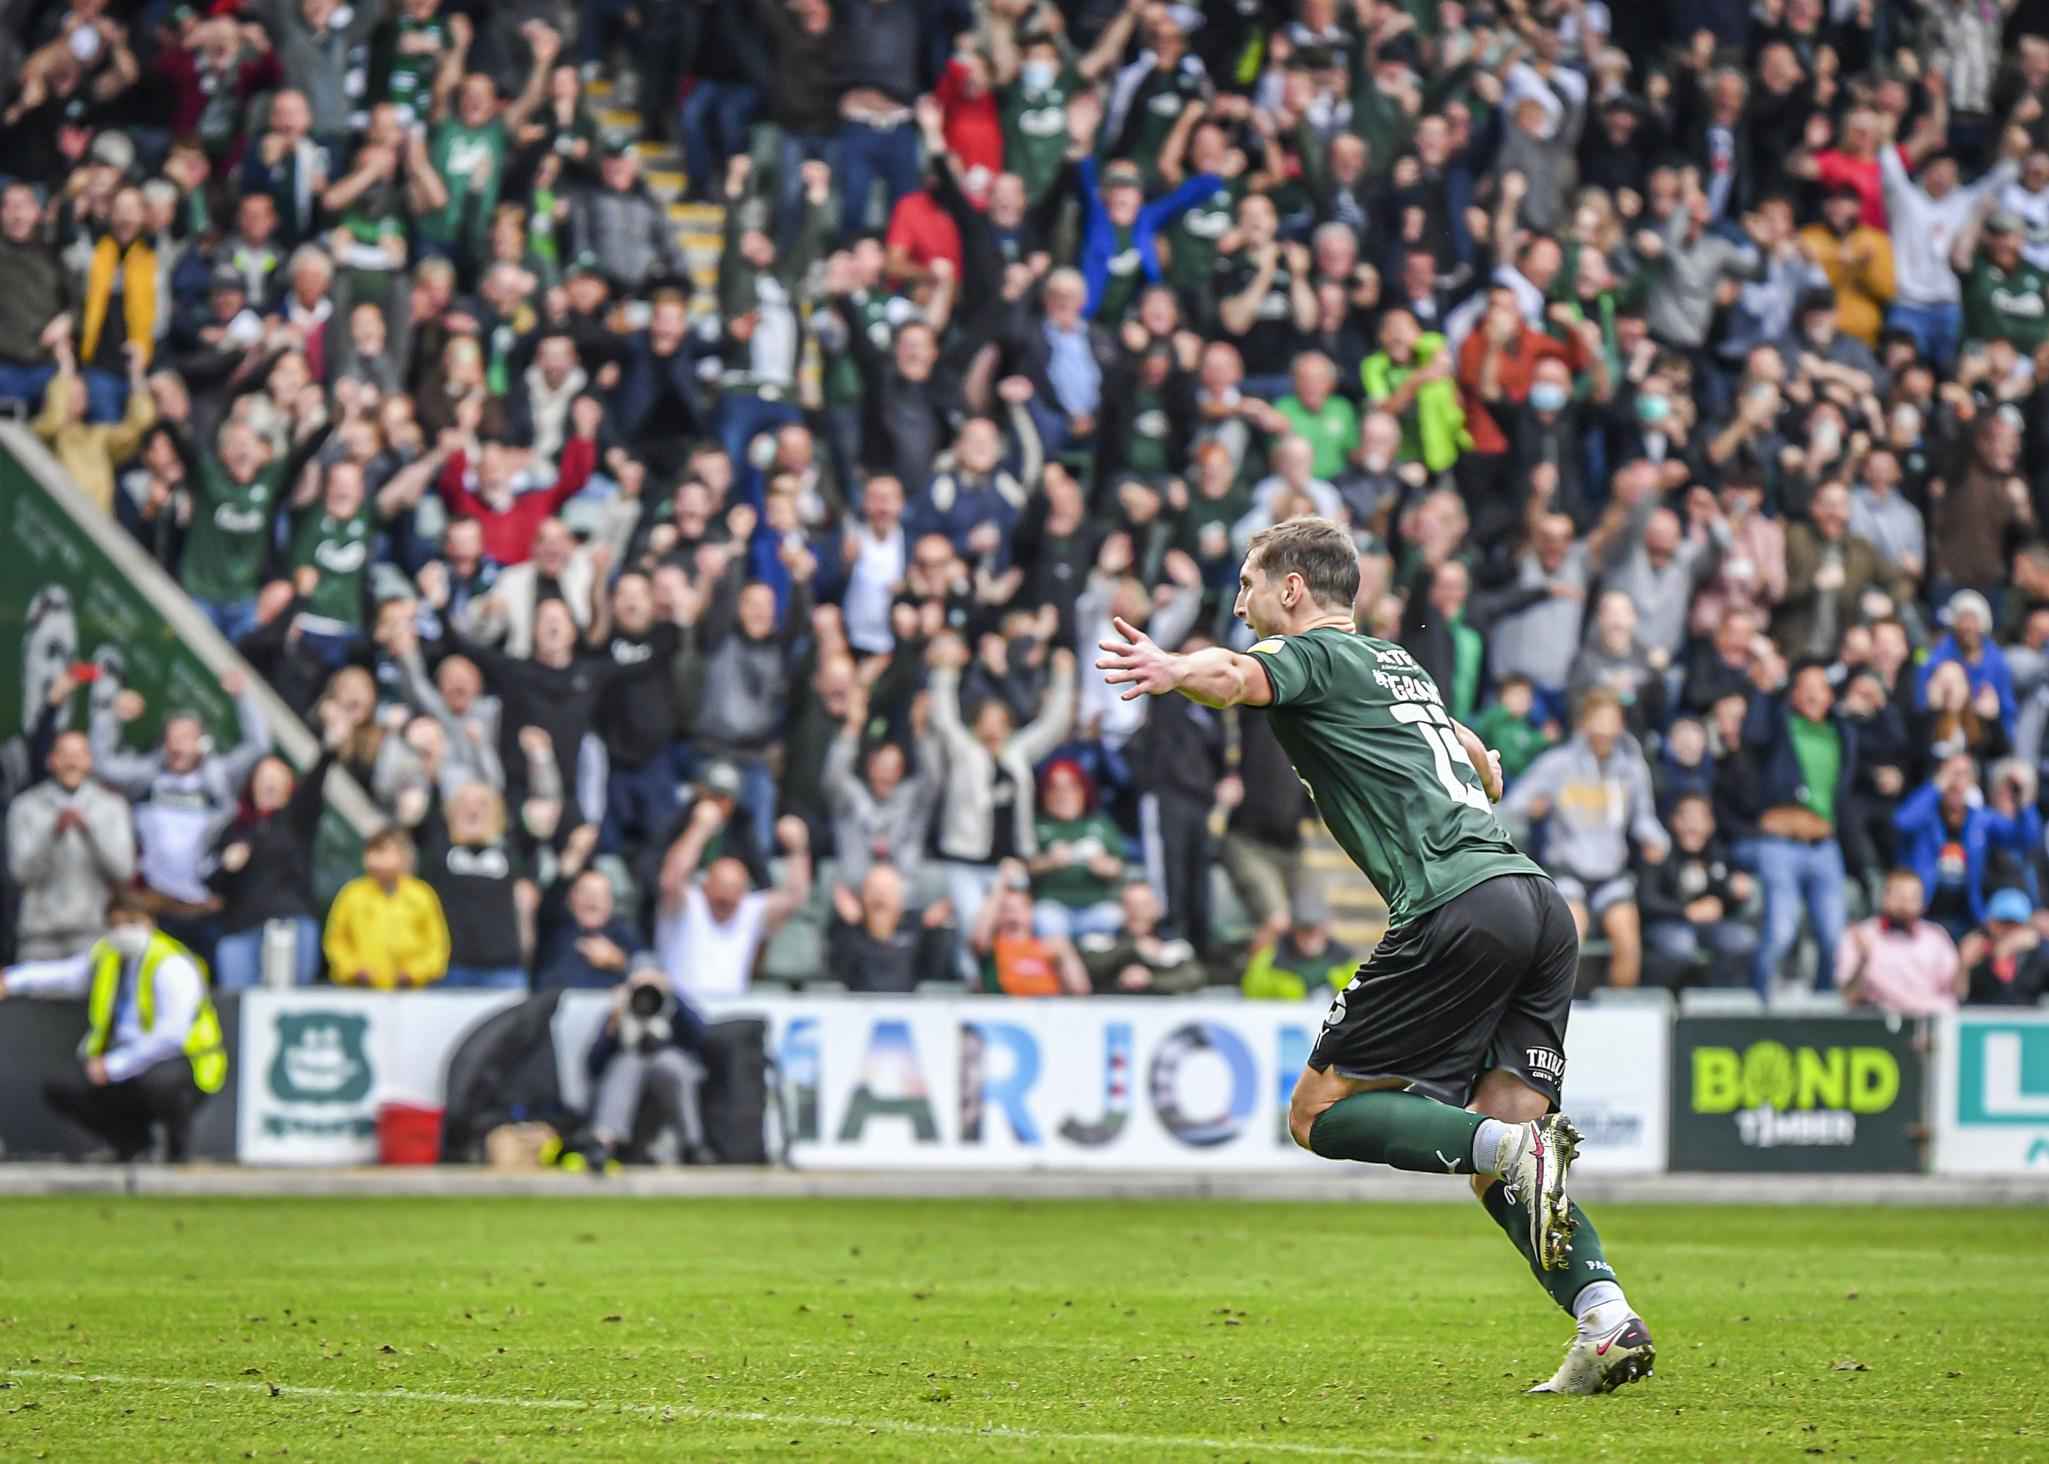 Grant v Doncaster